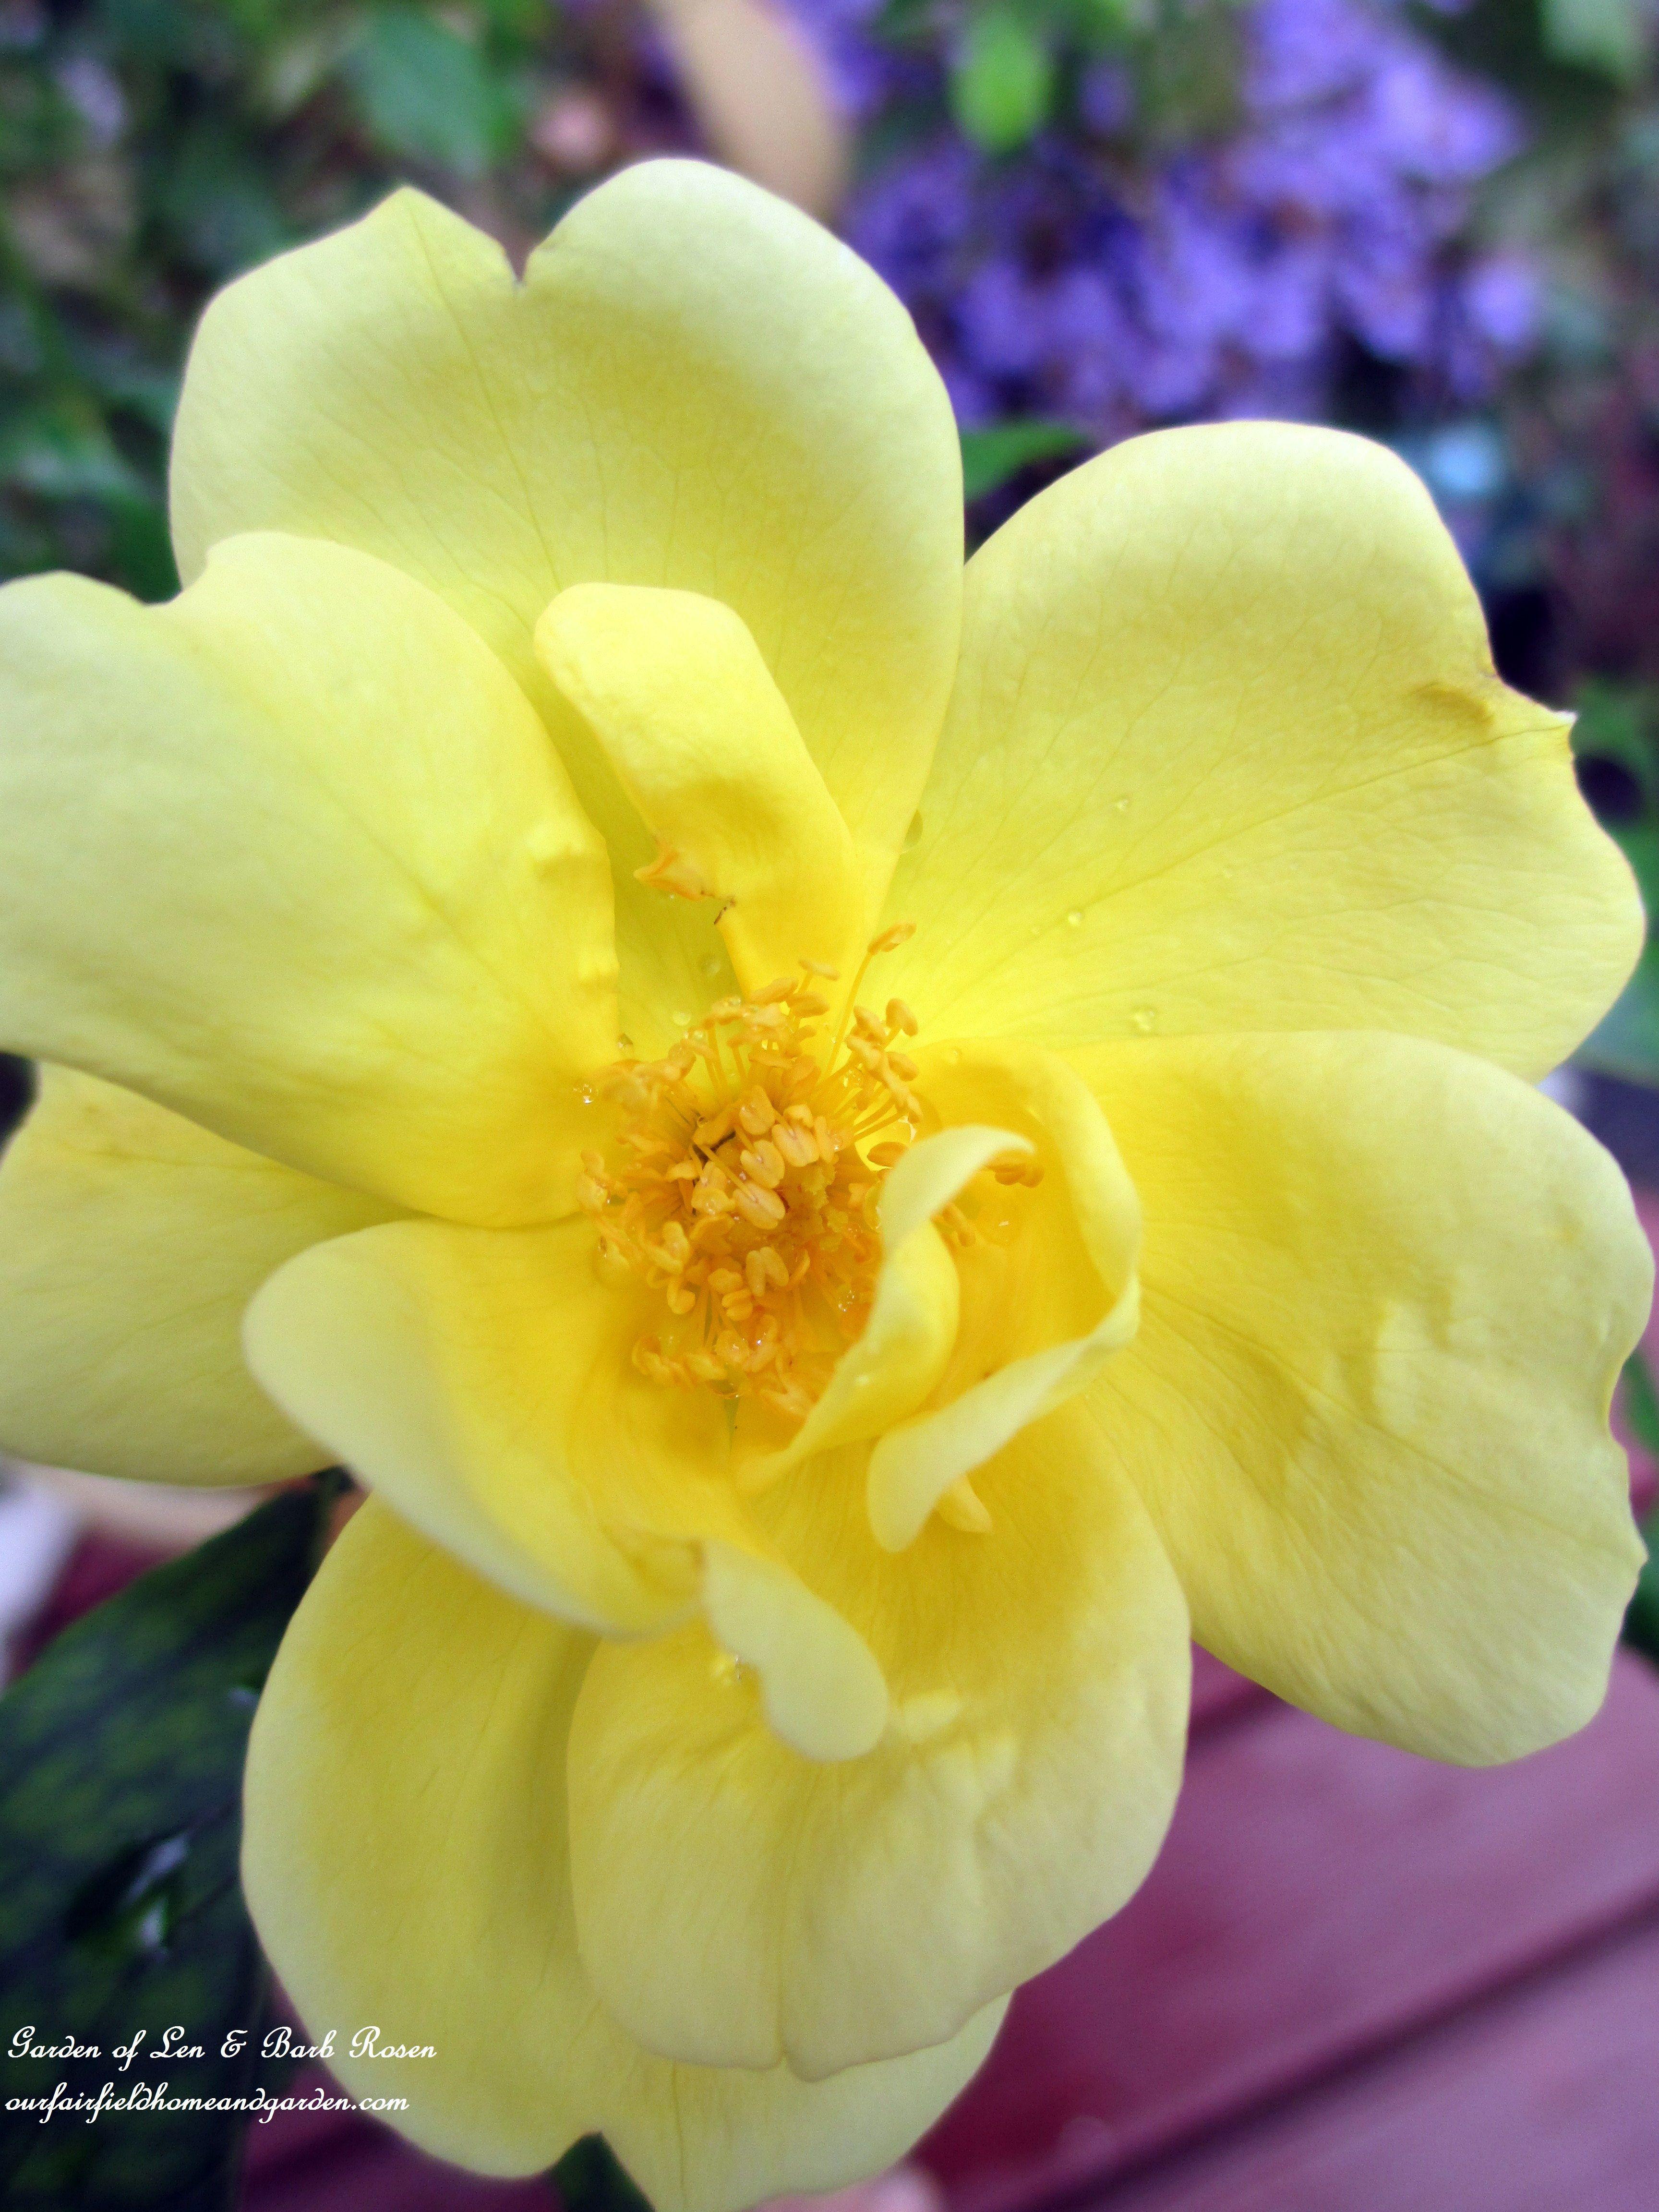 Yellow Knockout Rose (Garden of Len & Barb Rosen) #knockoutrosen Yellow Knockout Rose (Garden of Len & Barb Rosen) #knockoutrosen